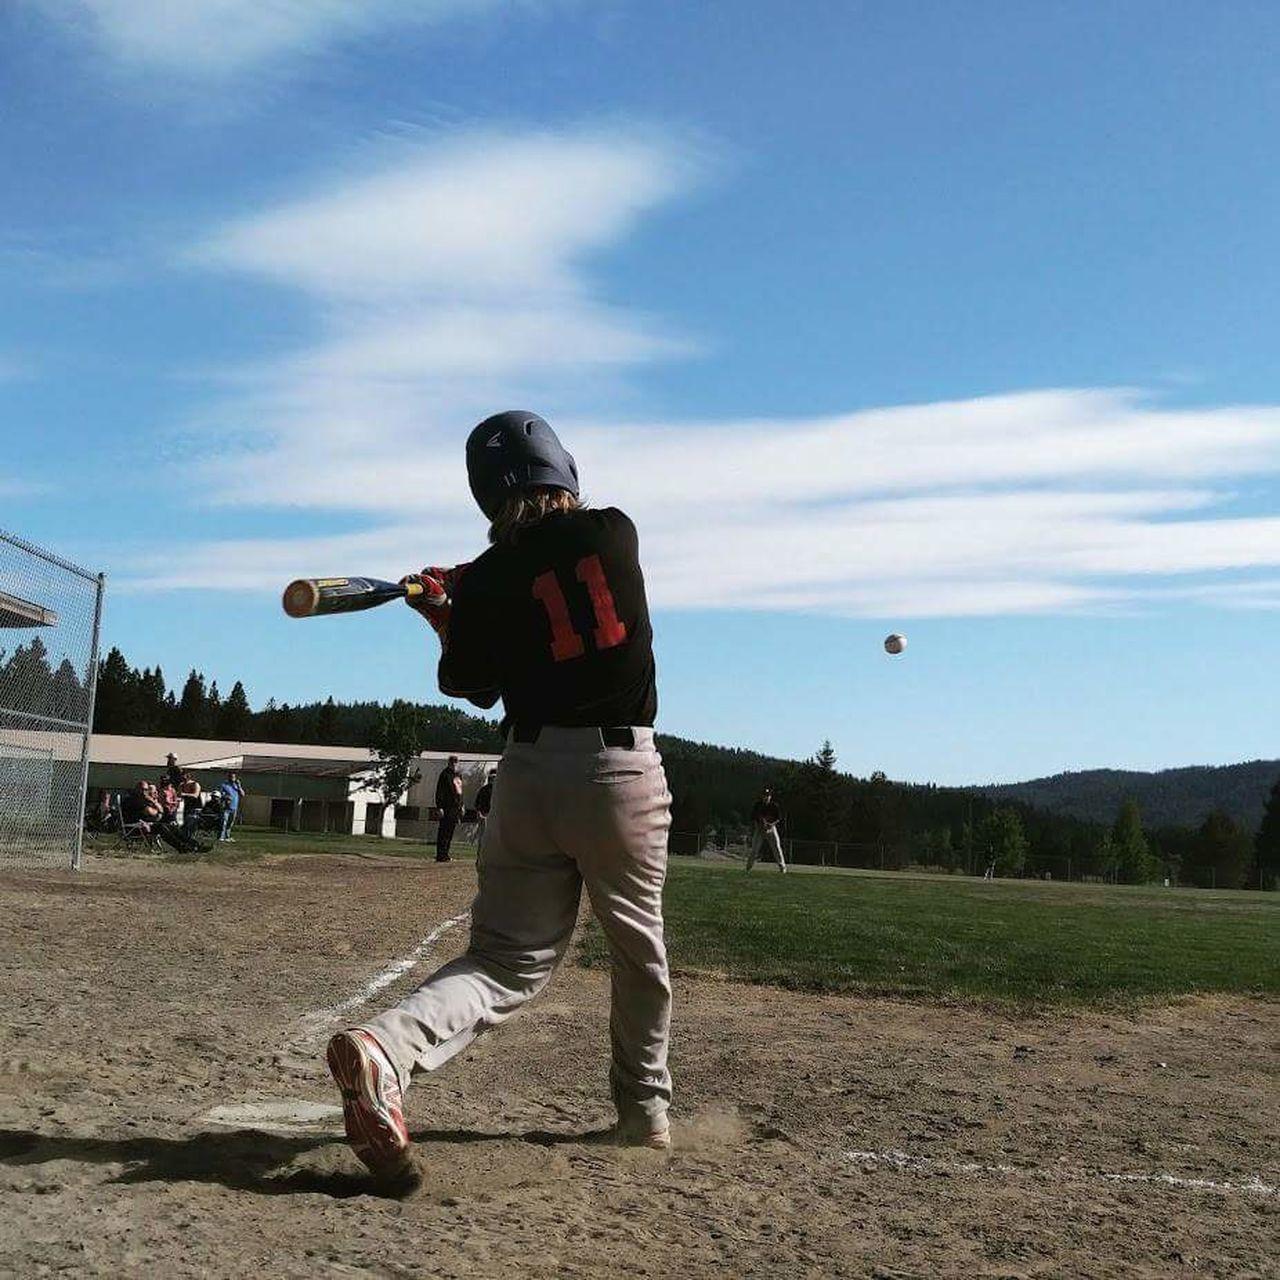 People And Places Dramatic Angles Baseball Baseball Game Baseball ⚾ Baseball Player BaseballLife Baseball Bat Baseballplayer